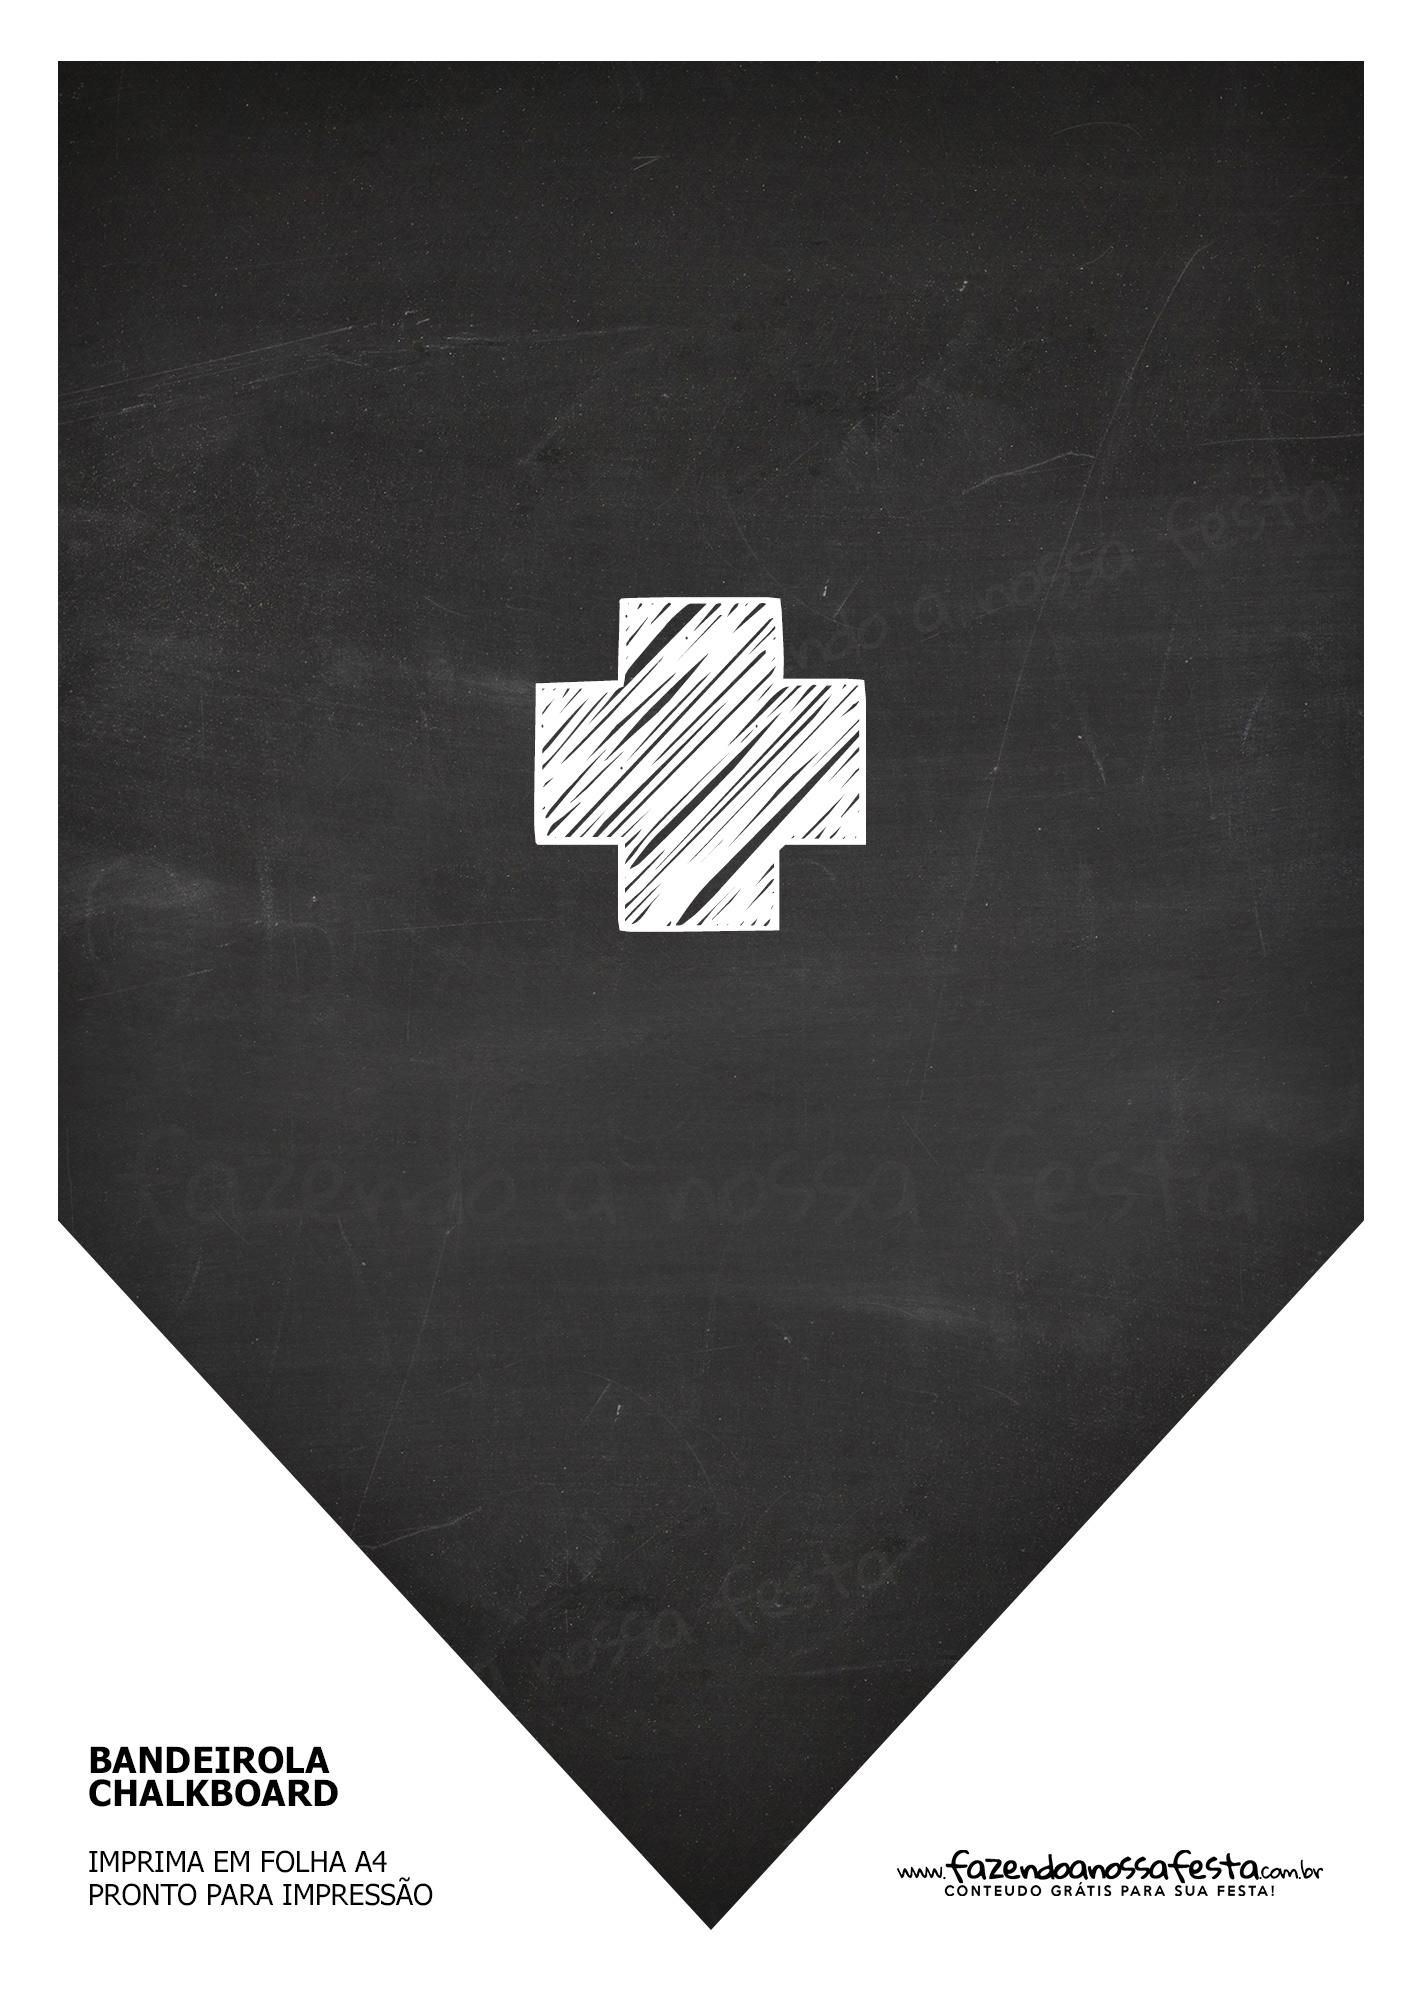 Bandeirinha Chalkboard Mais